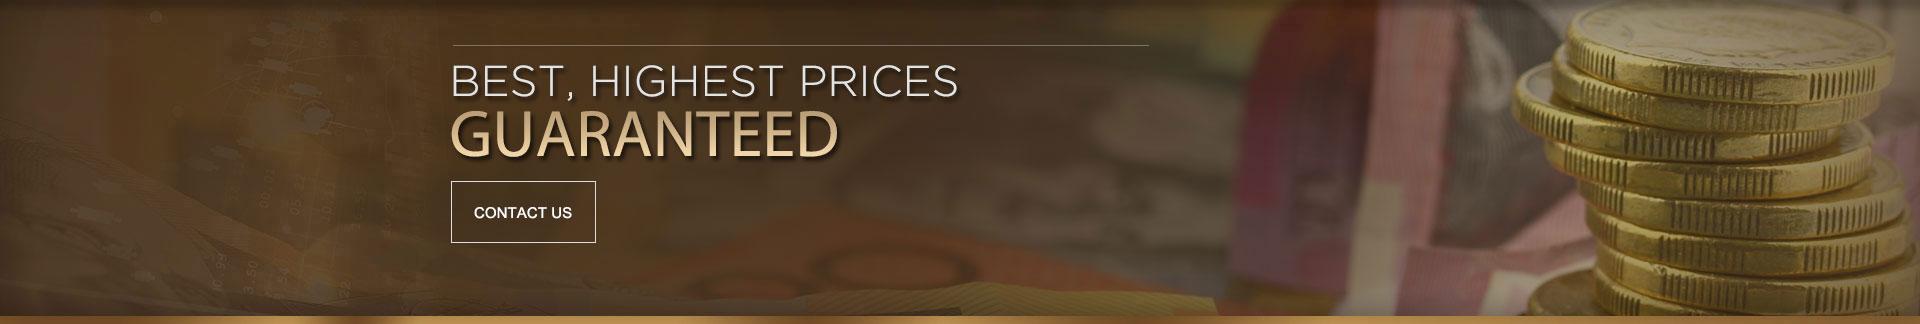 Best Highest Prices Guranteed